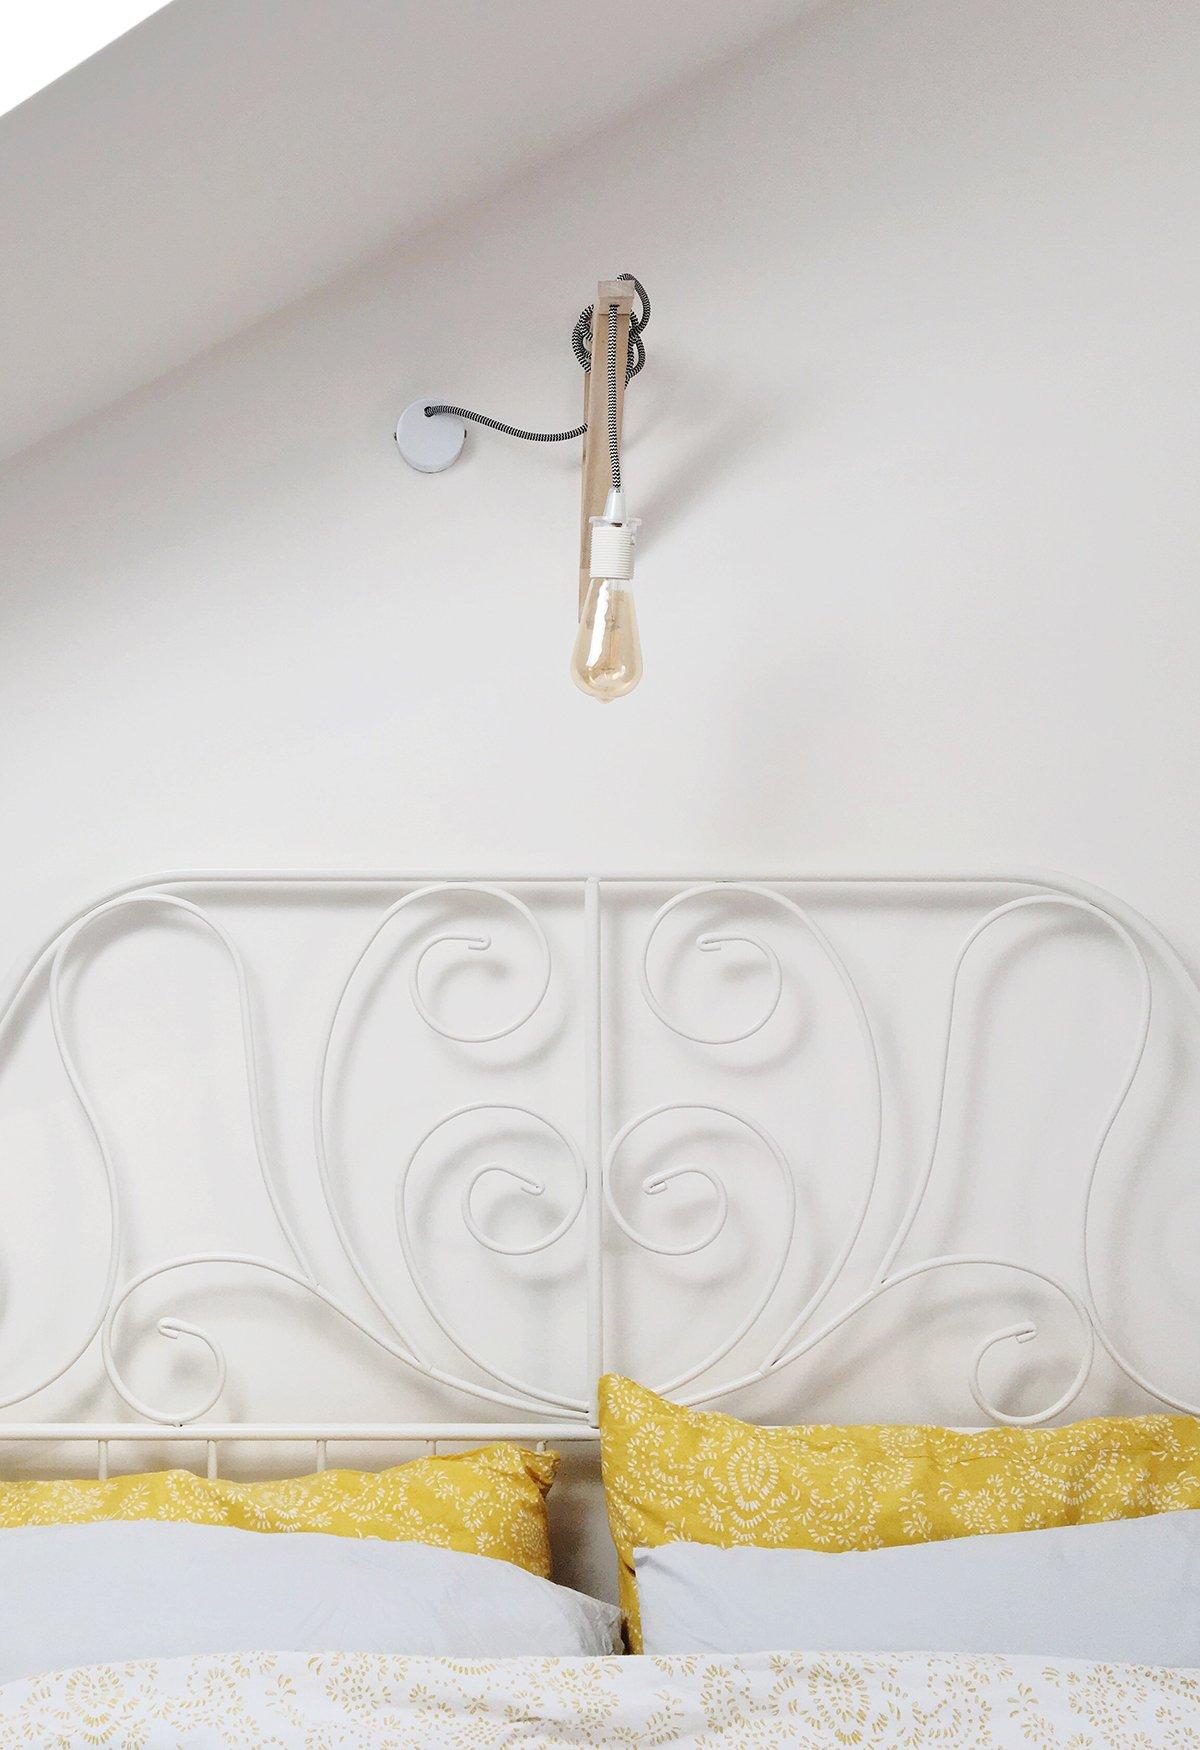 DIY_wall_hanging_lamp_lightbulb_2